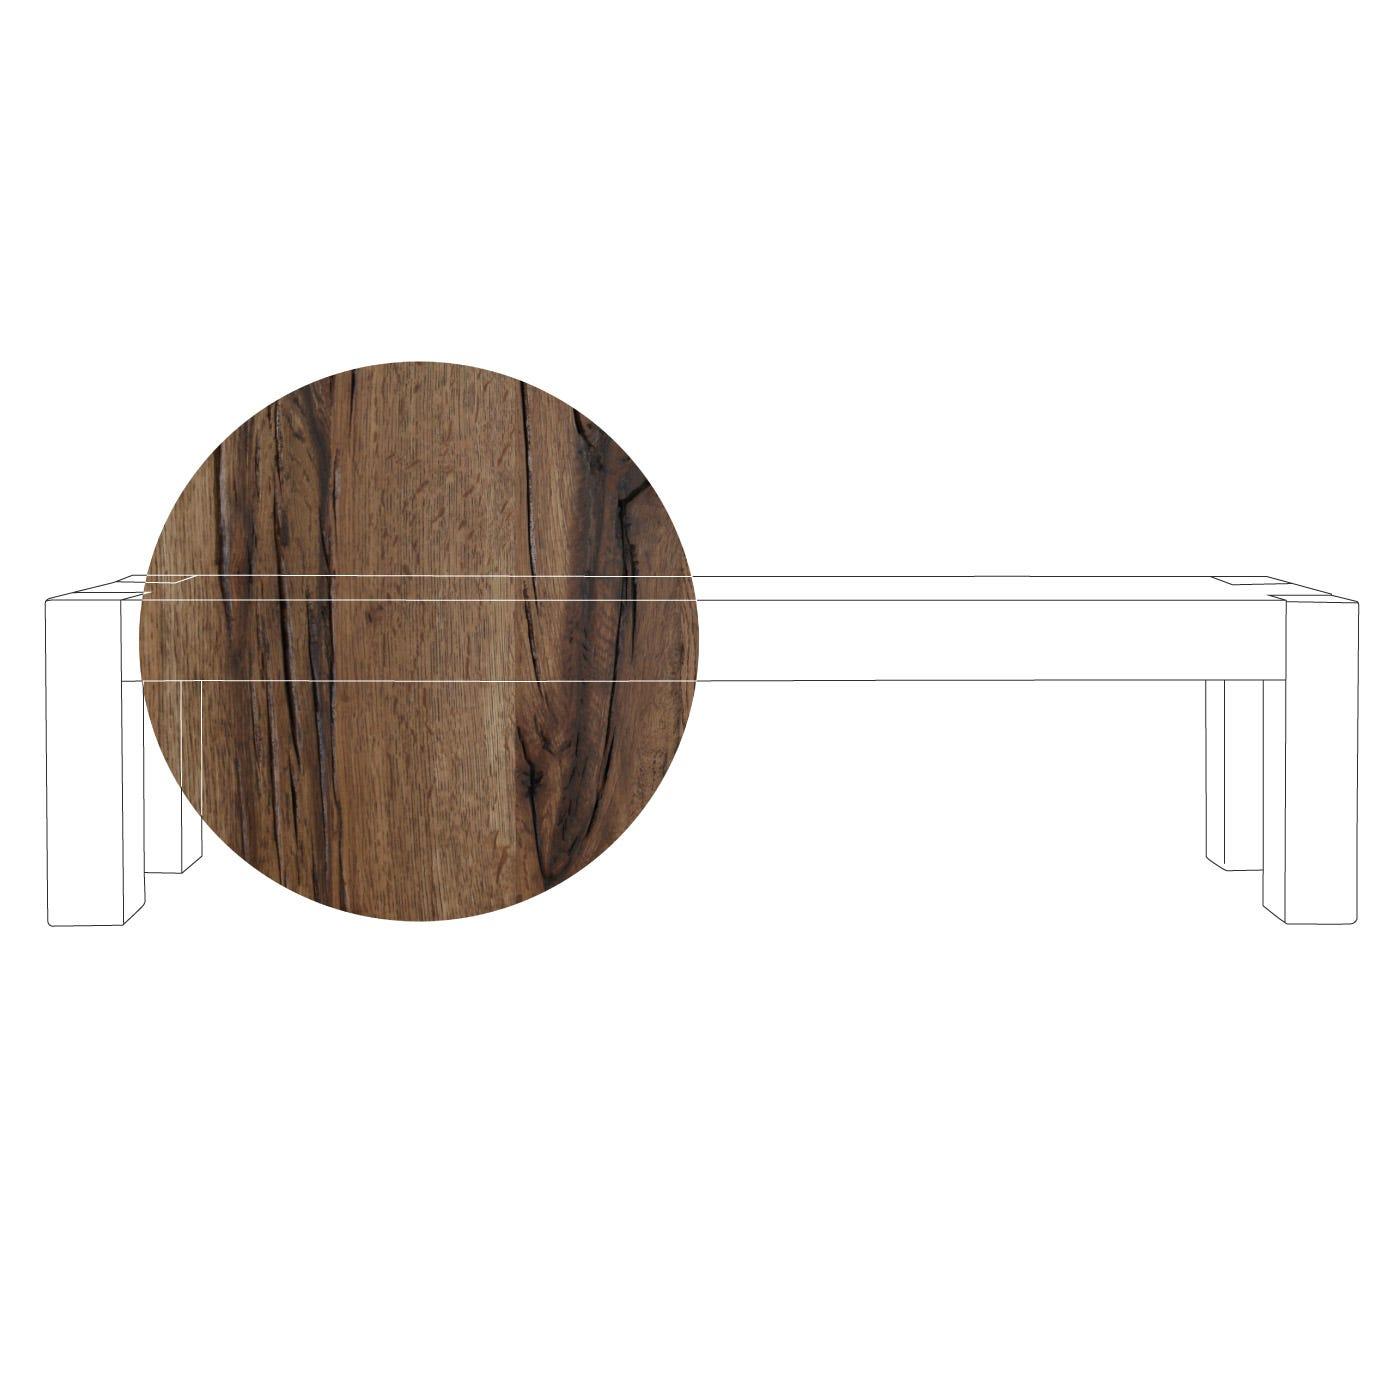 Umbrian Bench